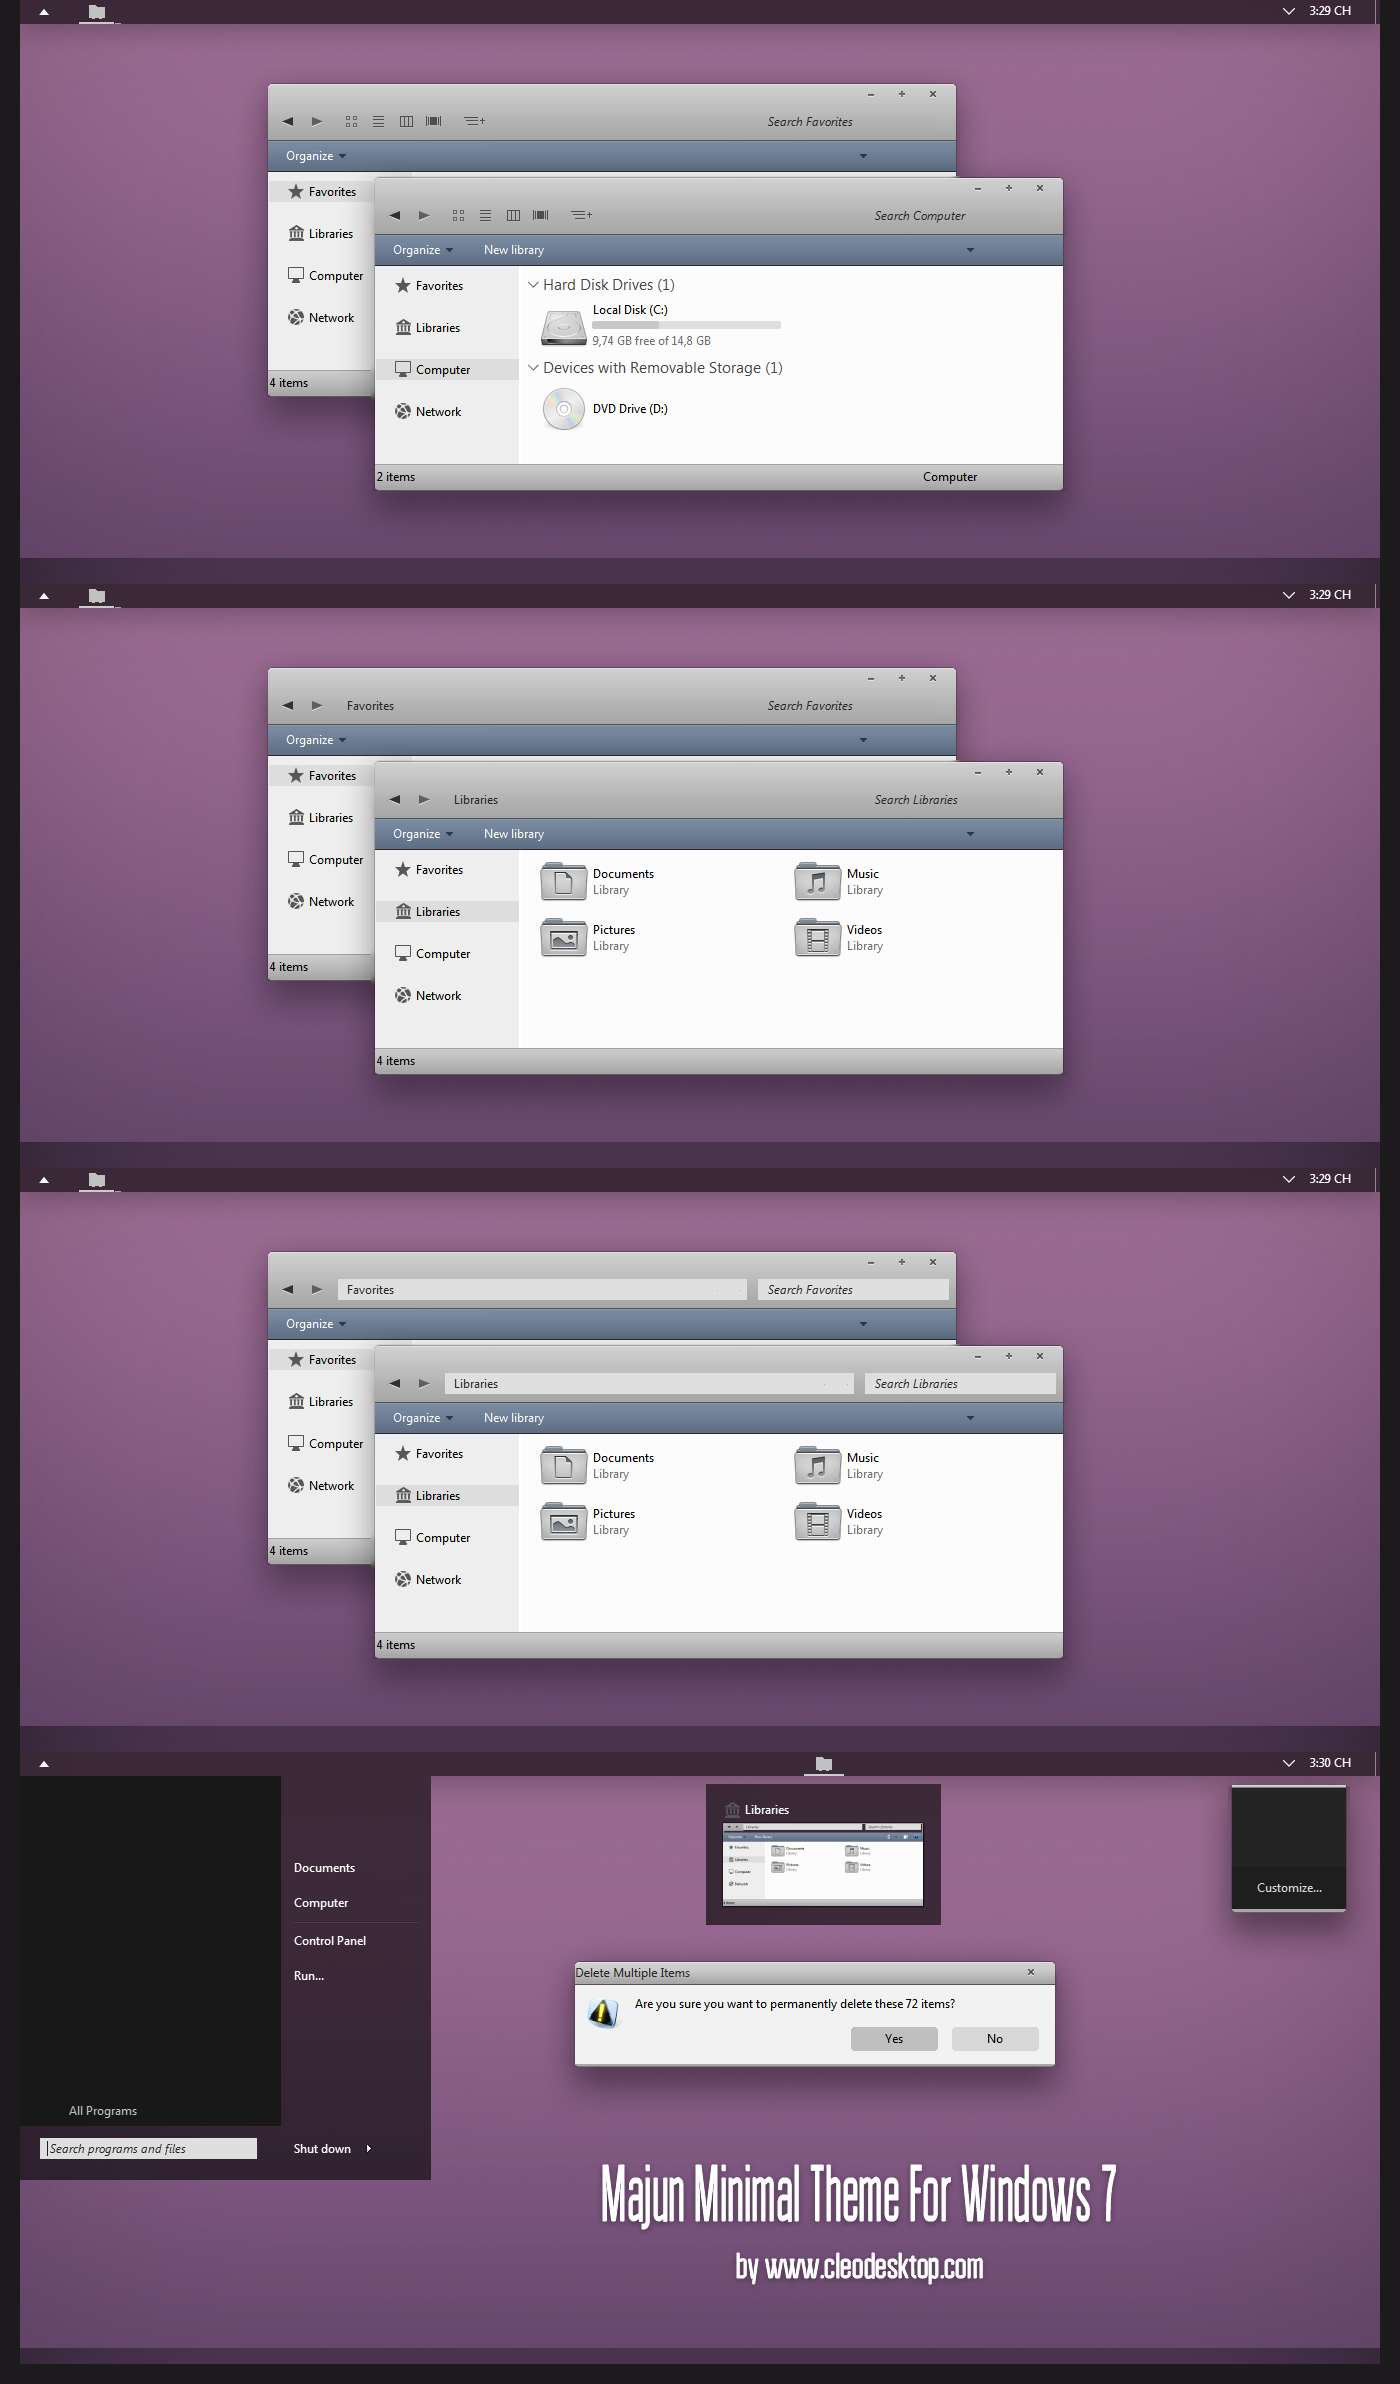 MaJun Minimal Theme For Windows 7